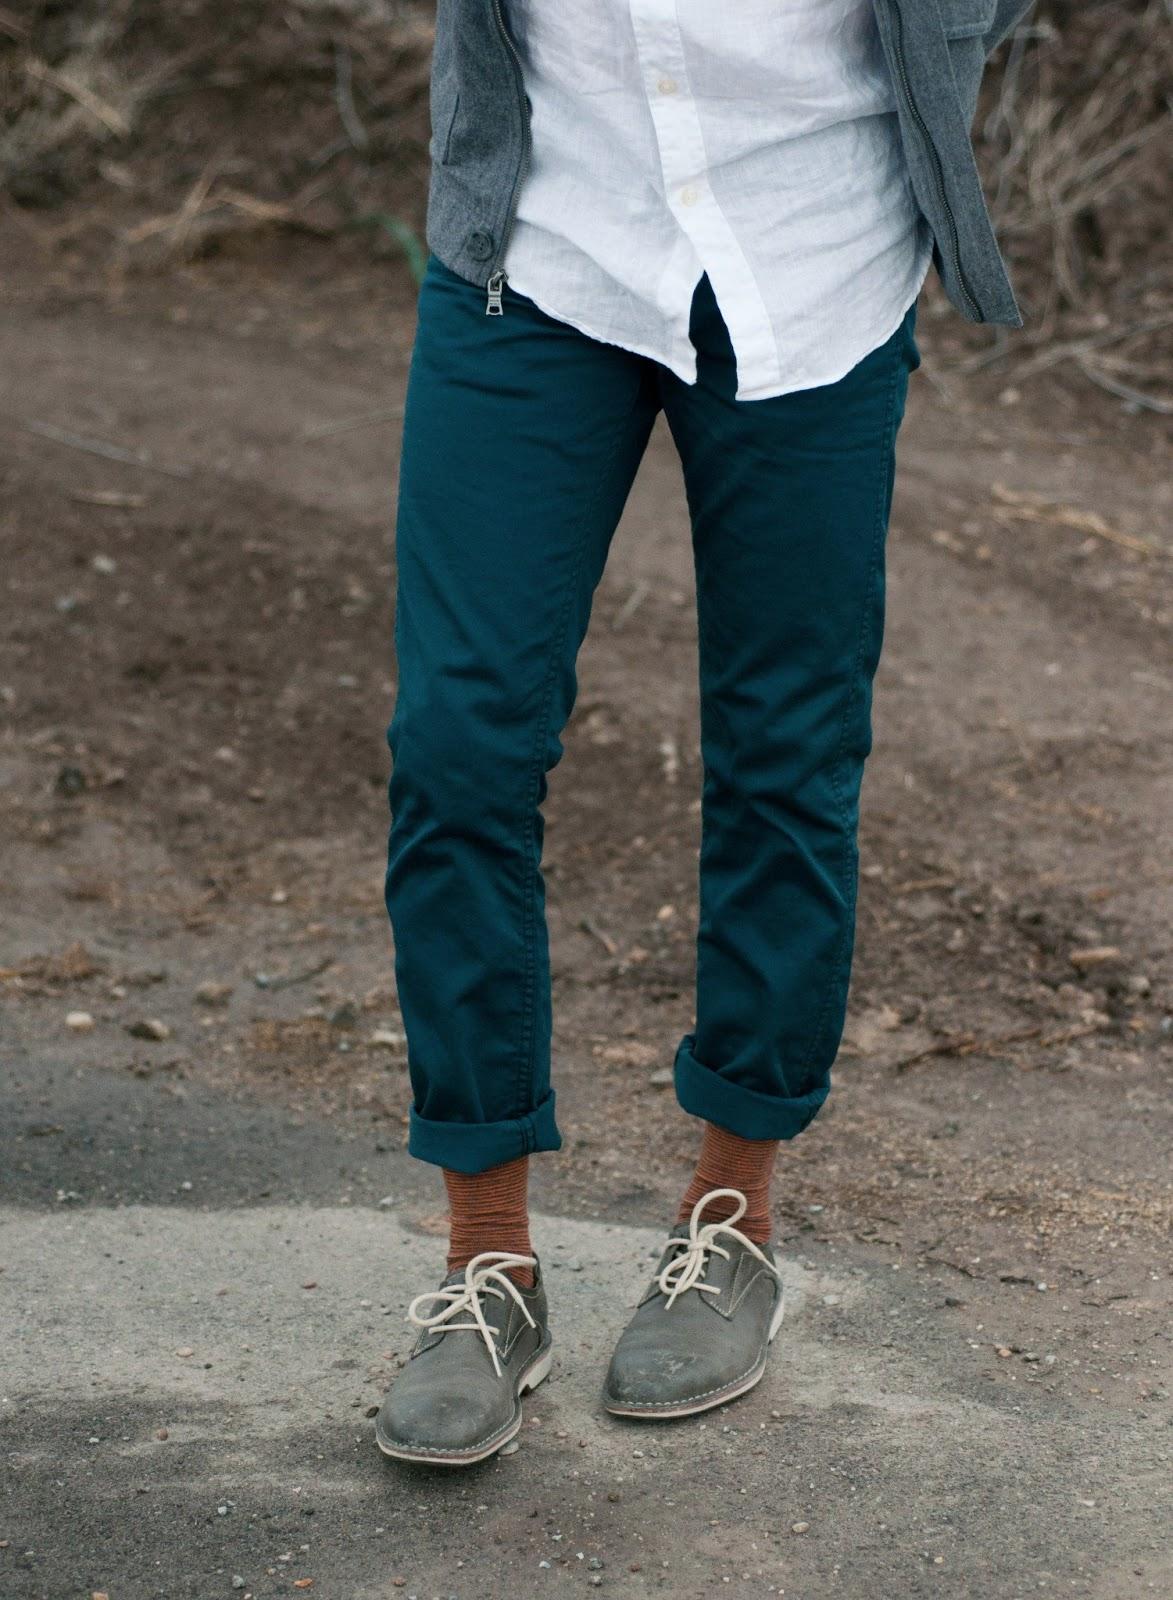 fashion blog, fashion blogger, anthropologie ootd, mens fashion blog, steve madden, mens fashion, style blog, fashion blog, zara, target, bow tie, mens bow tie, beanie, banana republic, levi, cole haan, jcrew, pirate socks